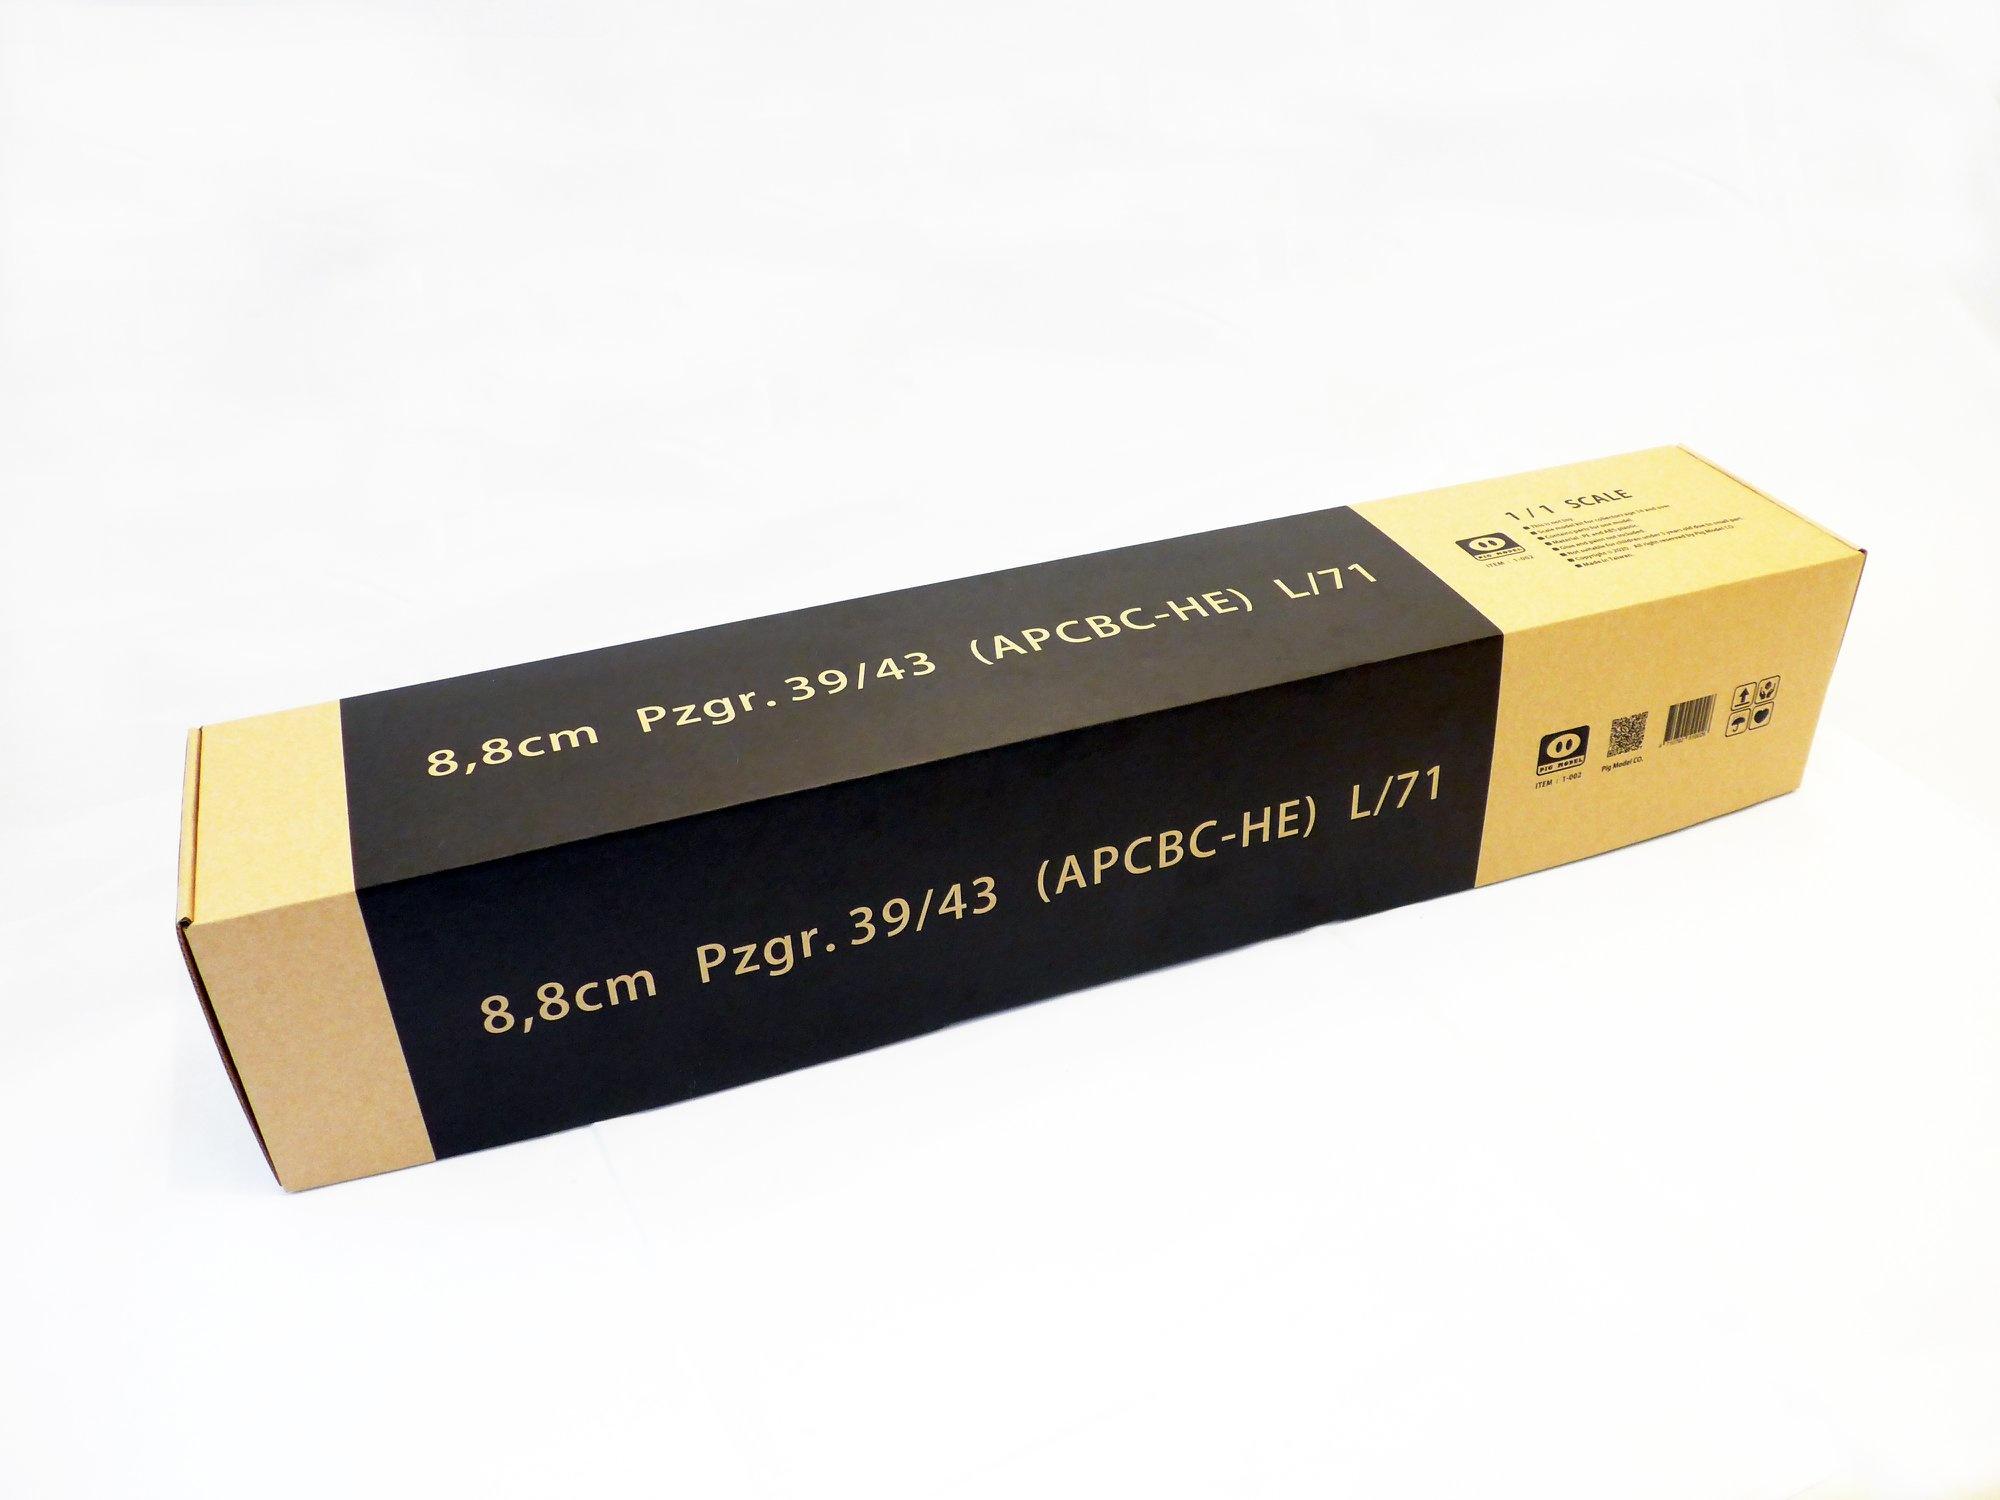 Pig Models 8.8Cm Pzgr.39/43 (Apcbc-He) L71 - Scale 1/1 - Pig Models - PMODEL002